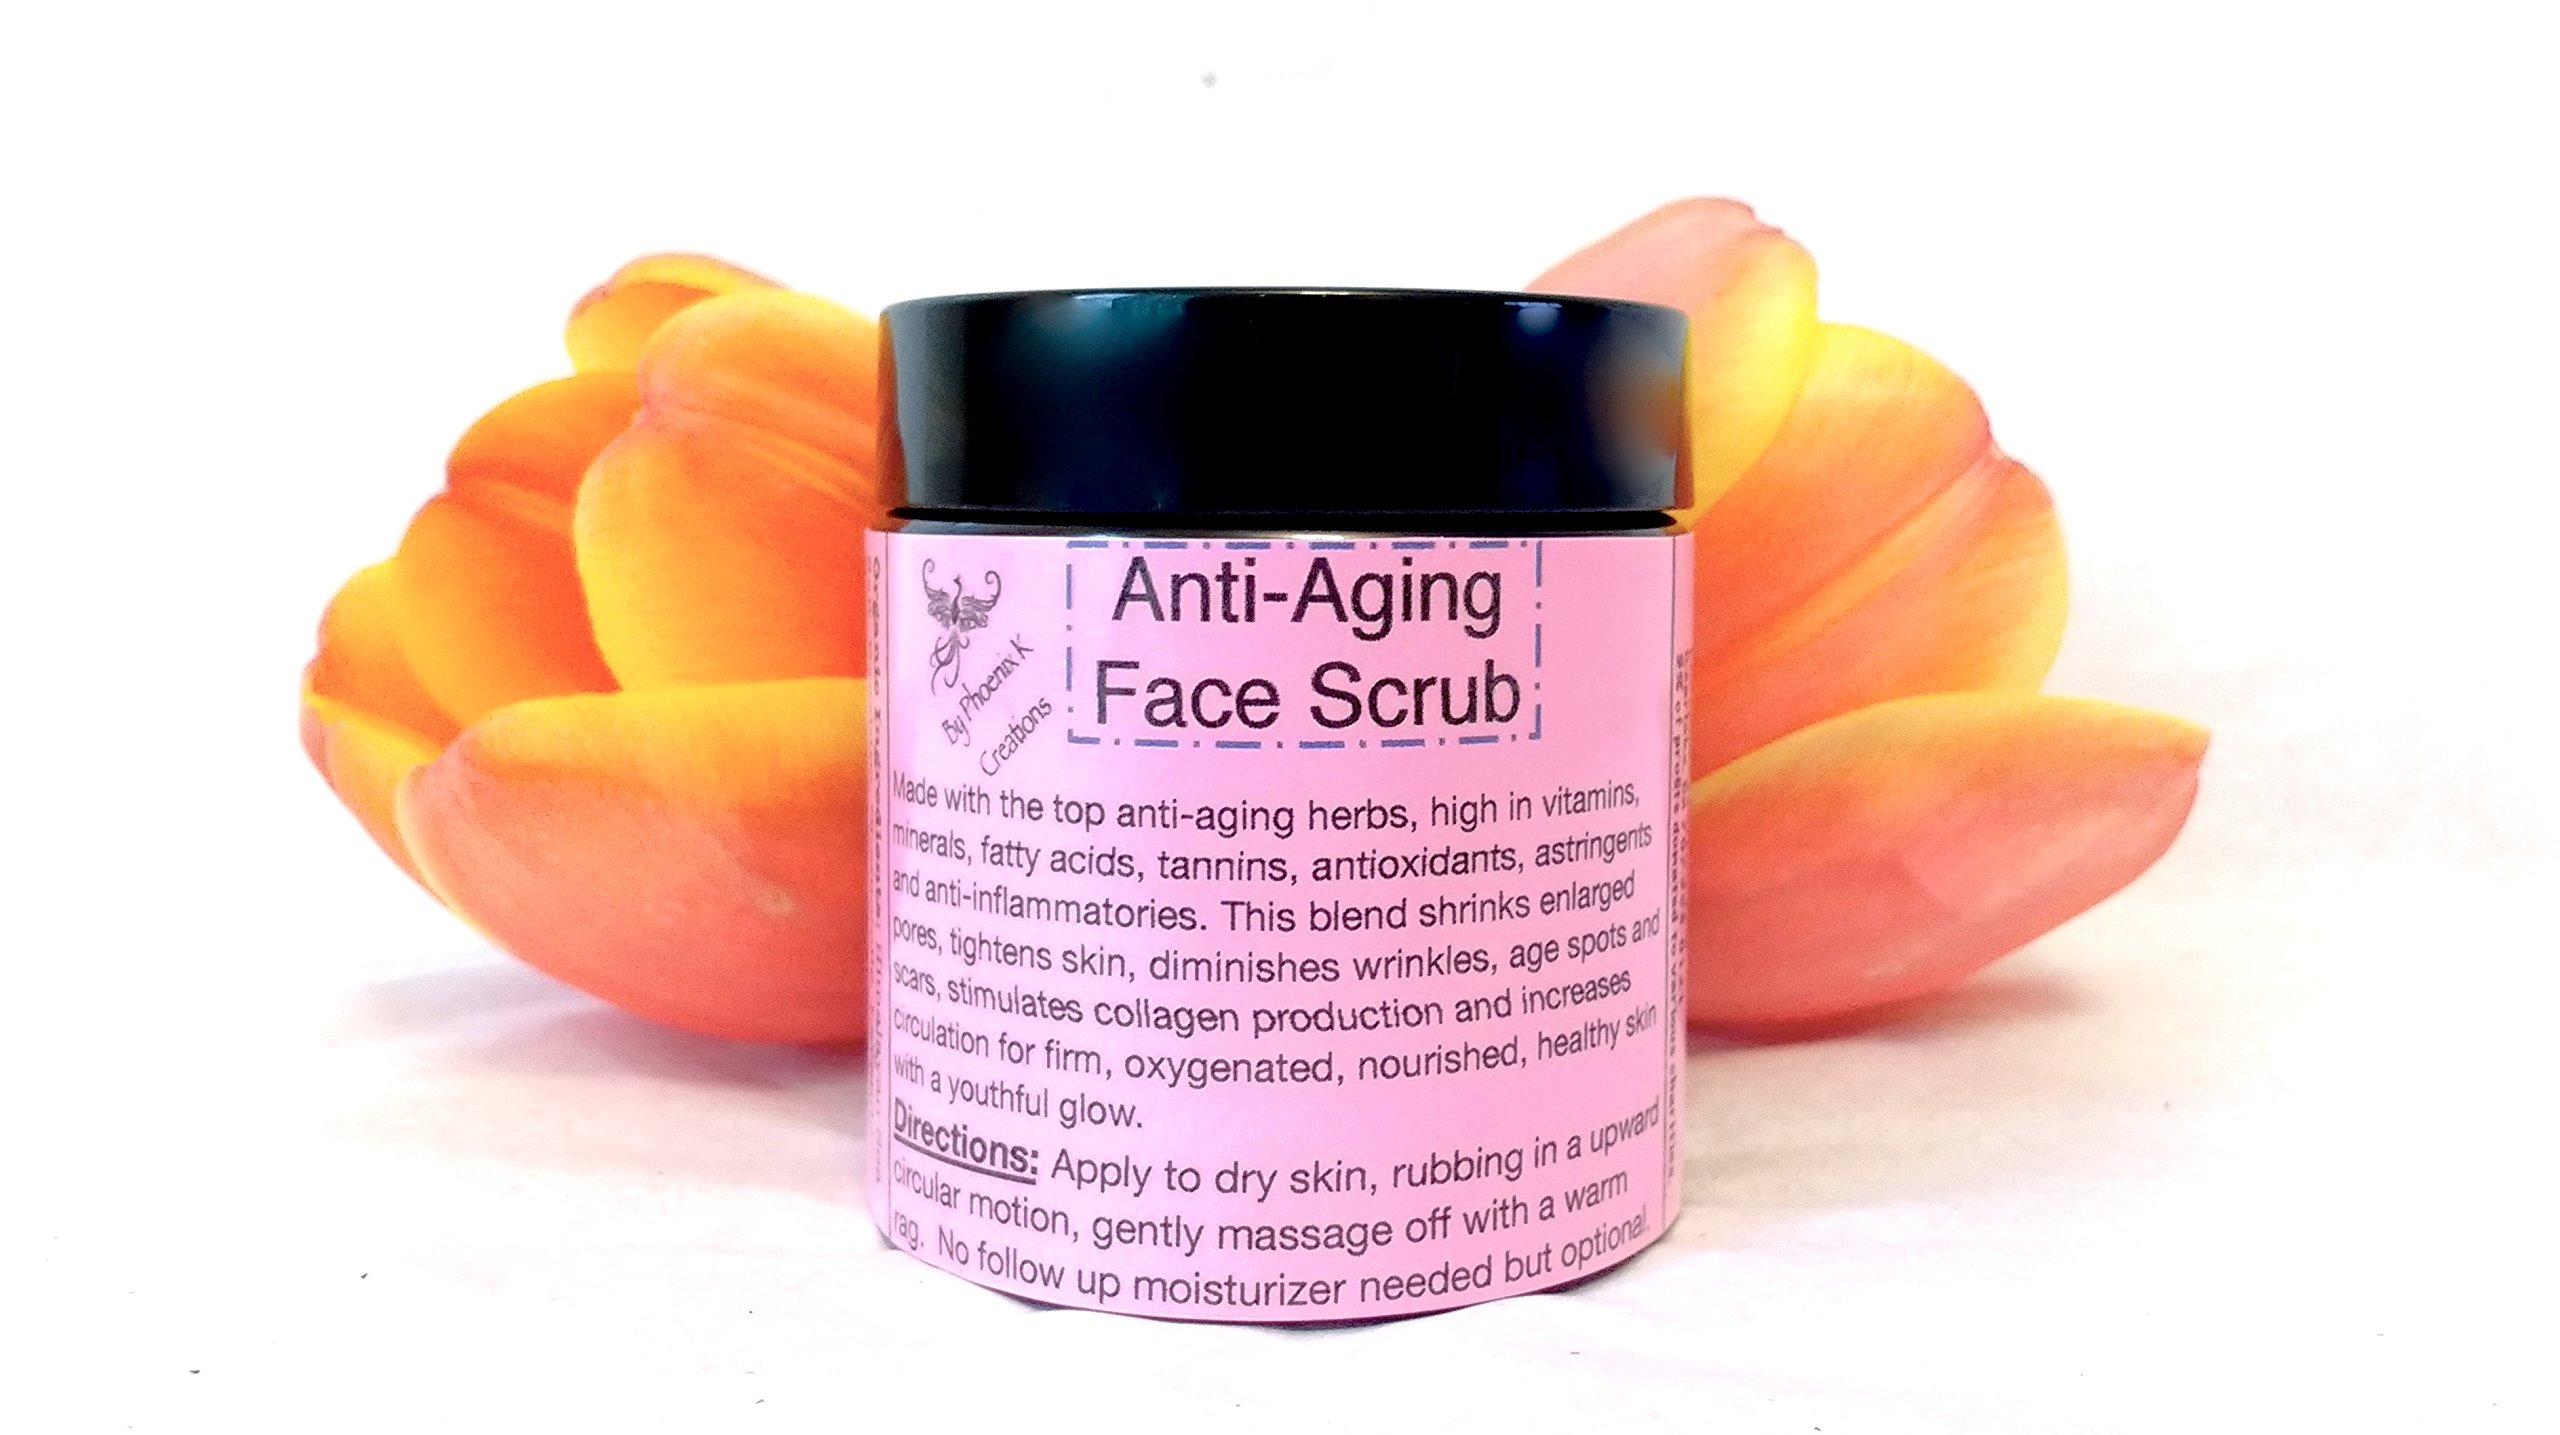 Anti-aging Face Scrub-Organic, Raw, Vegan, high in antioxidants and vitamins, firms skin, exfoliates, diminishes wrinkles.